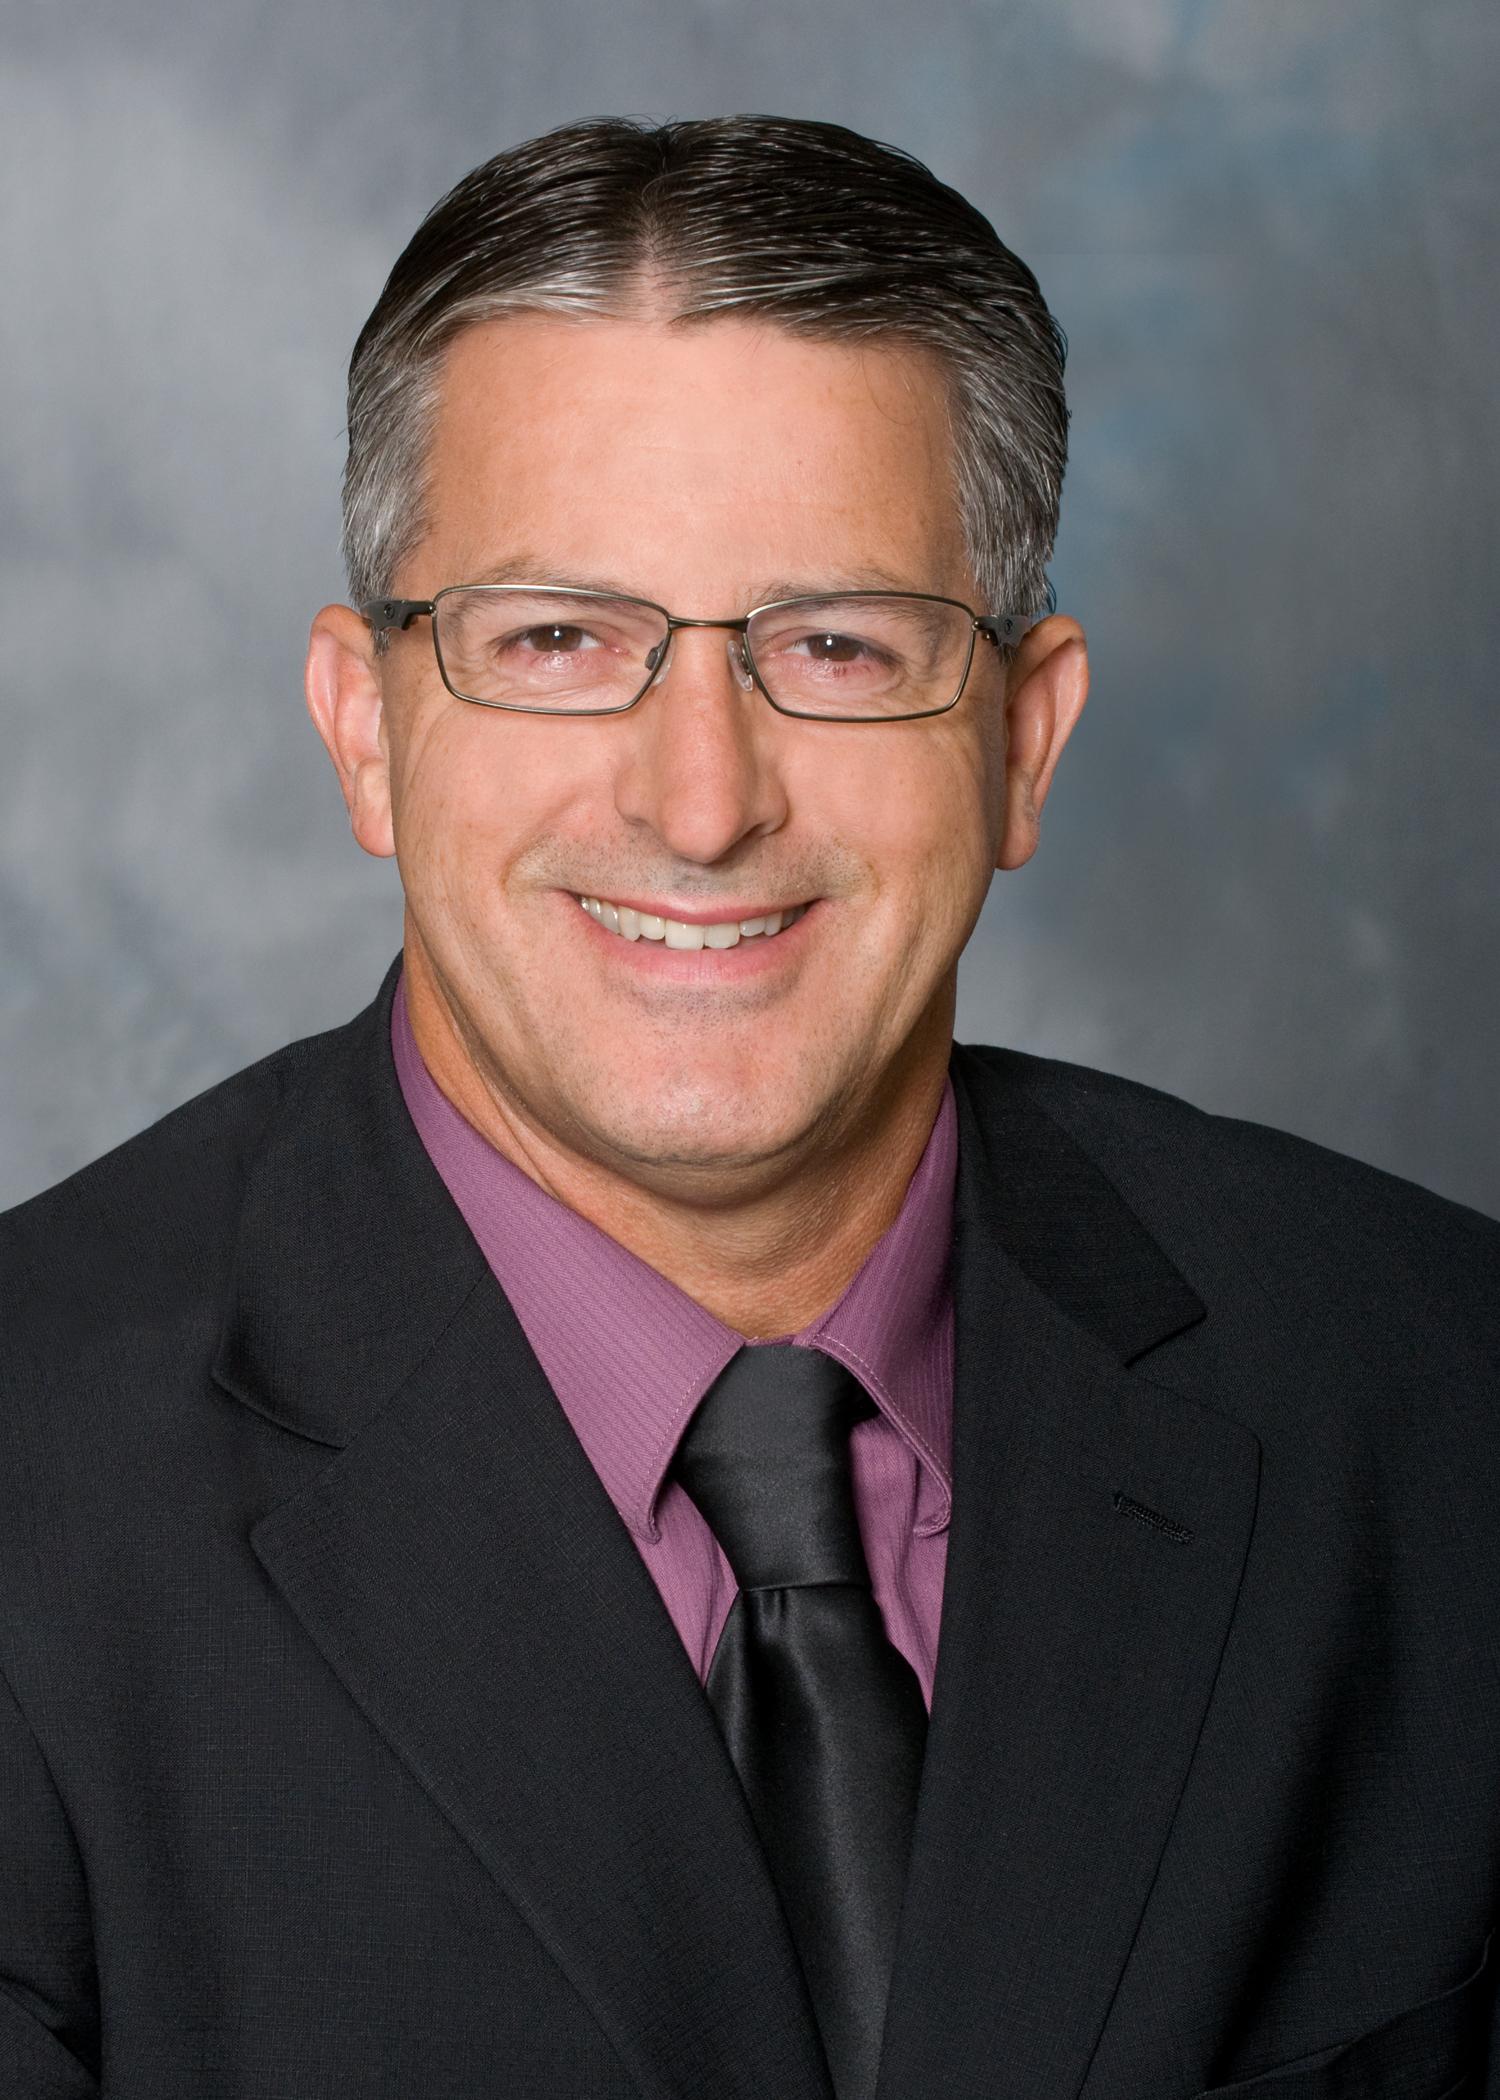 John Hays profile picture